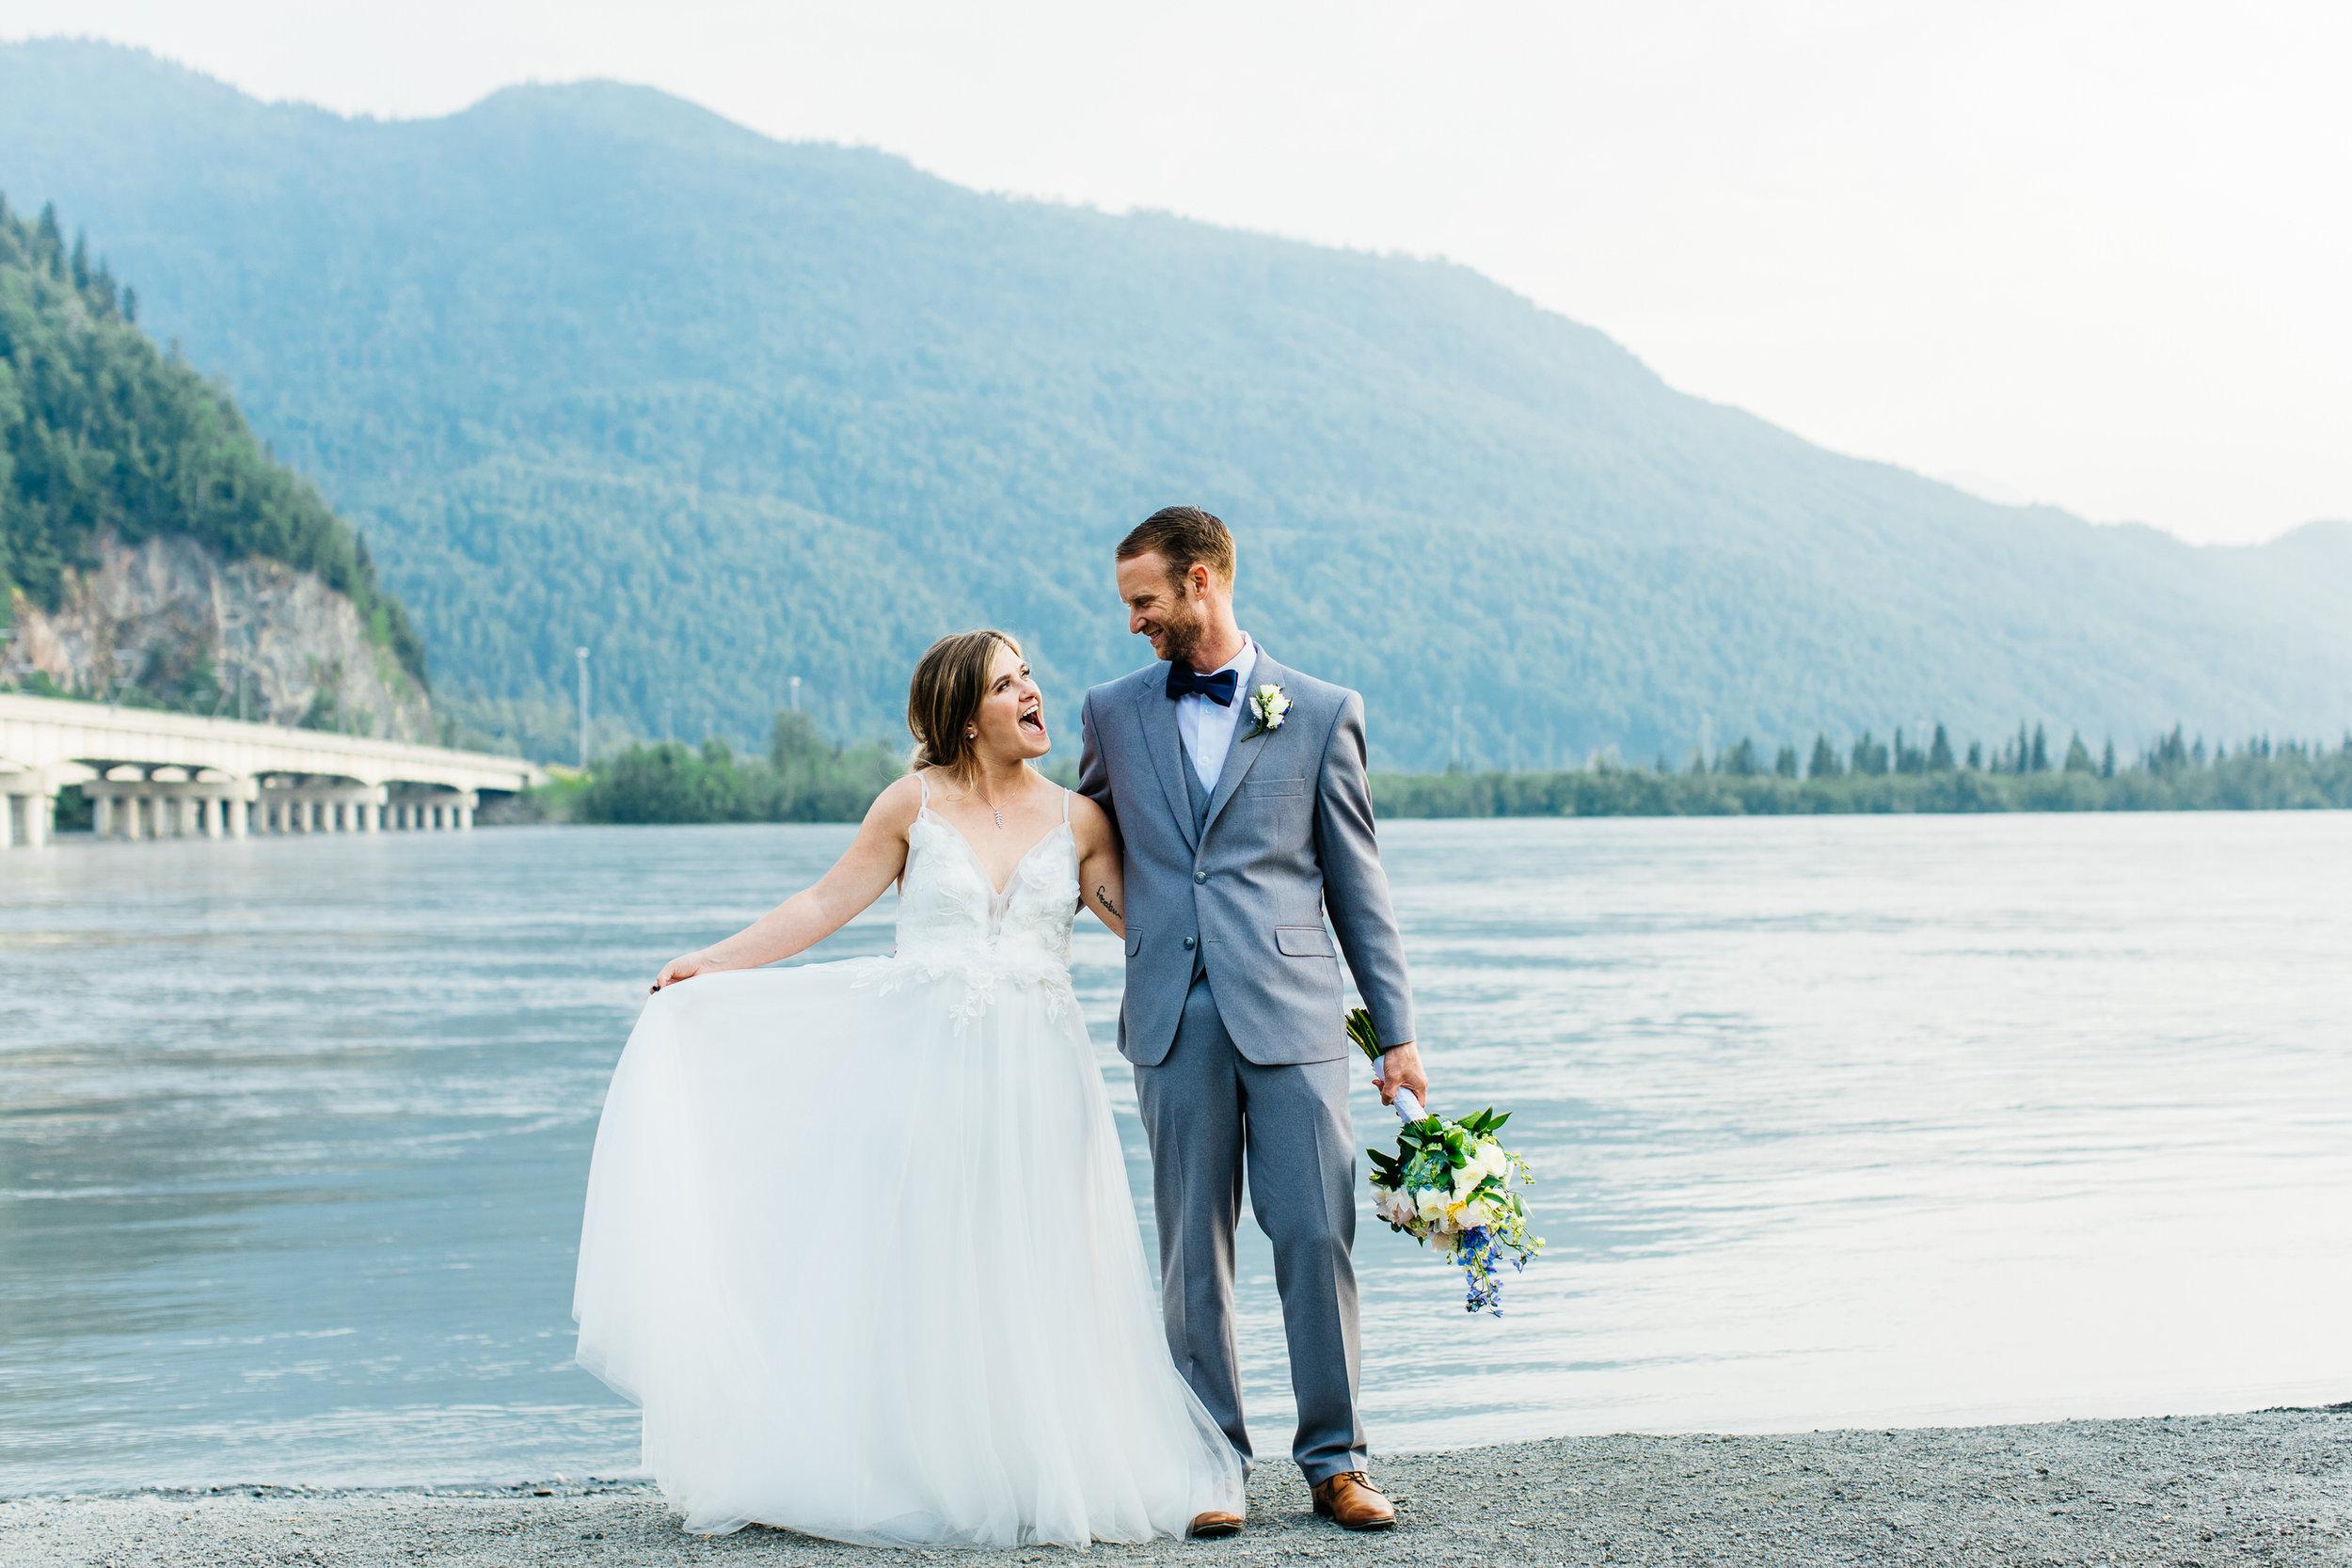 Aili + Joe's Wedding | By Erin Marton-451-1.jpg